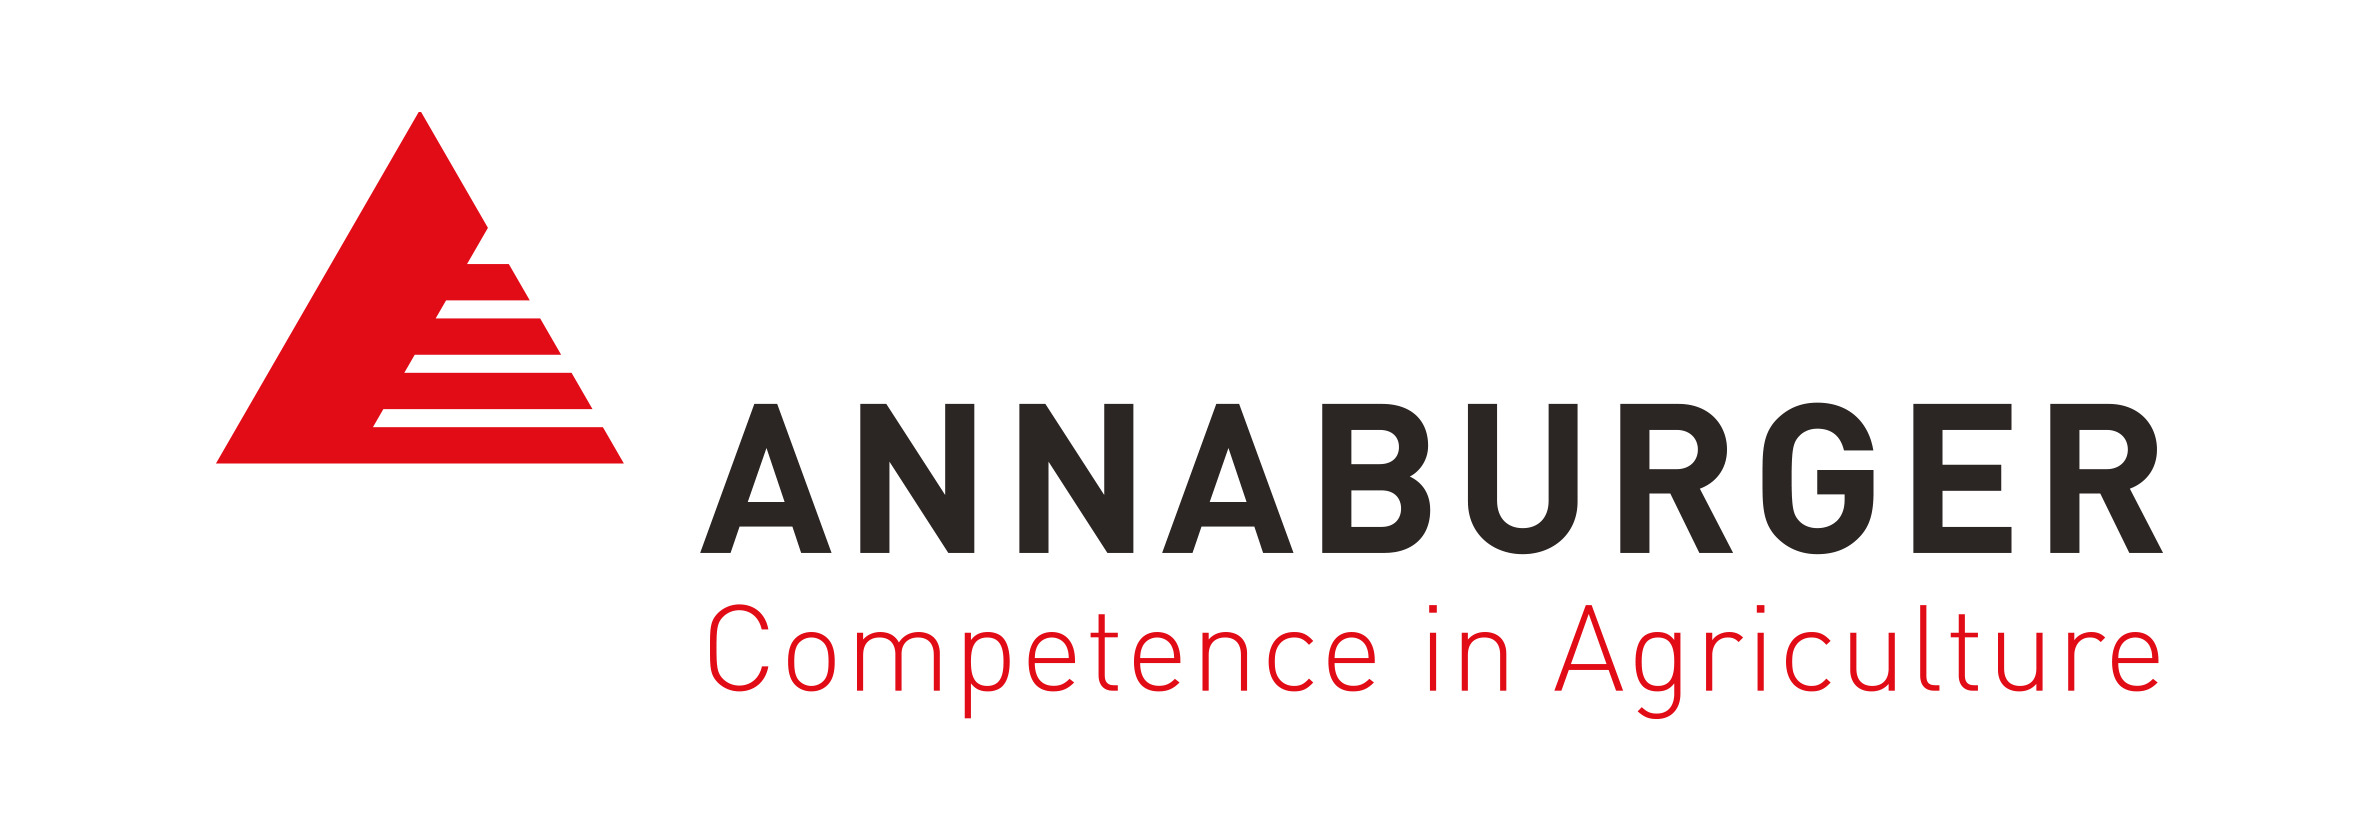 annaburger-logo